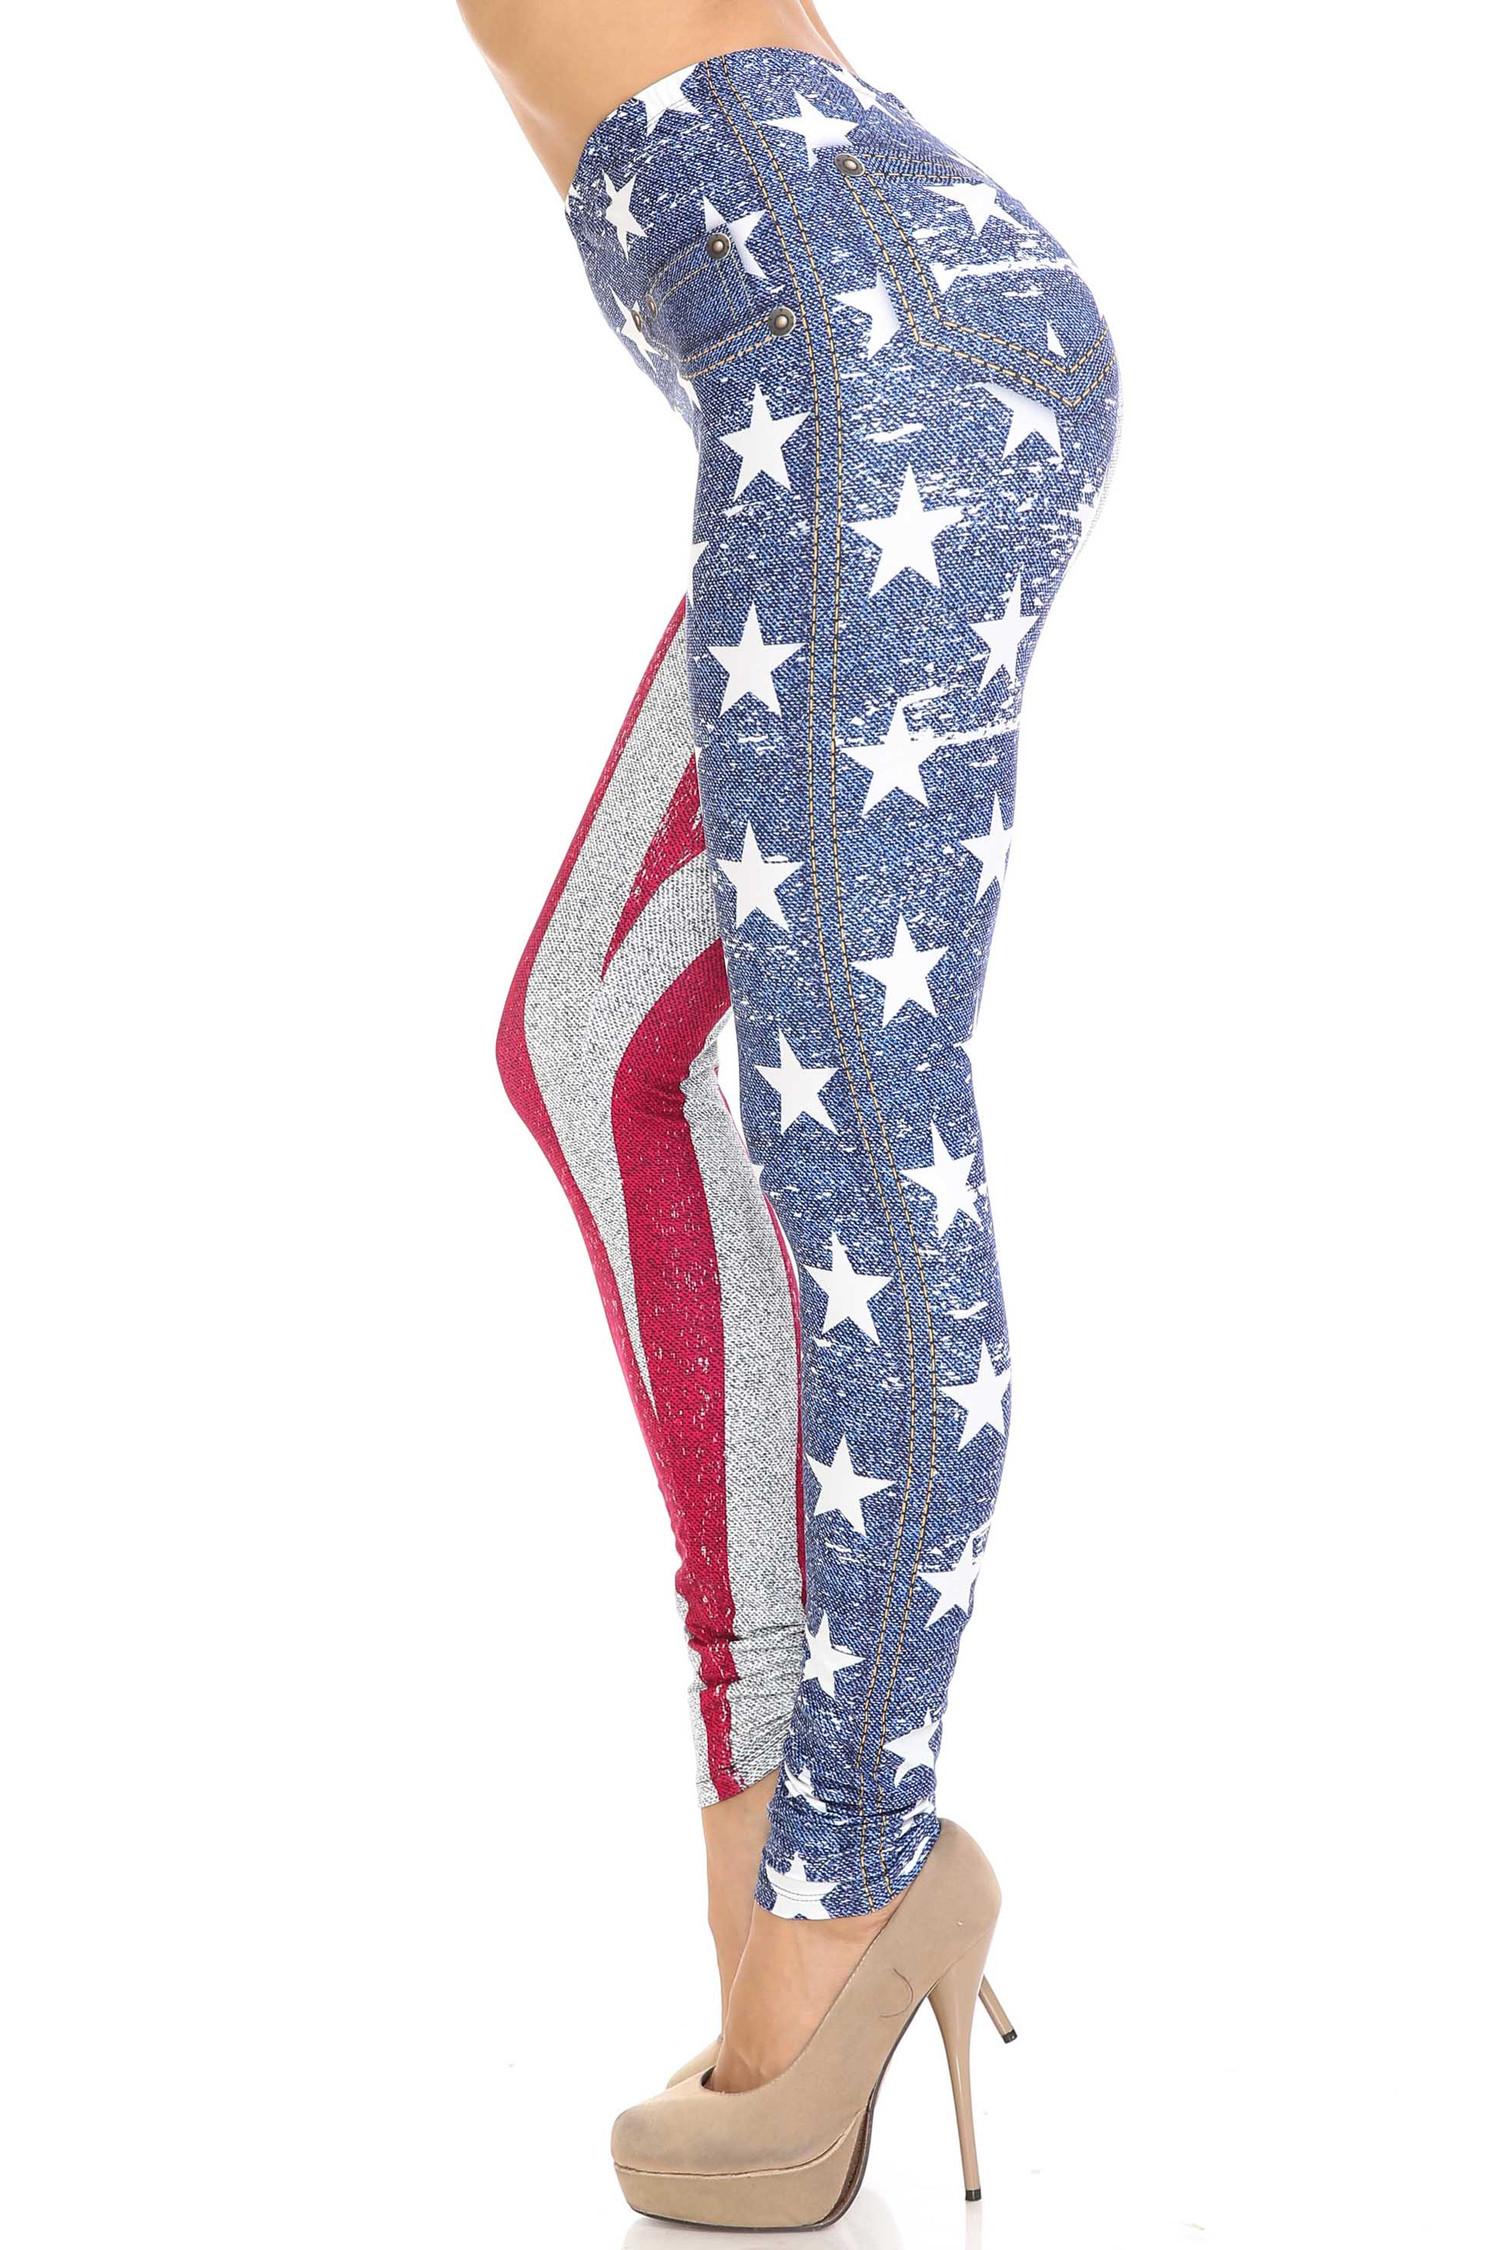 Creamy Soft USA Flag Denim Jeans Leggings - USA Fashion™